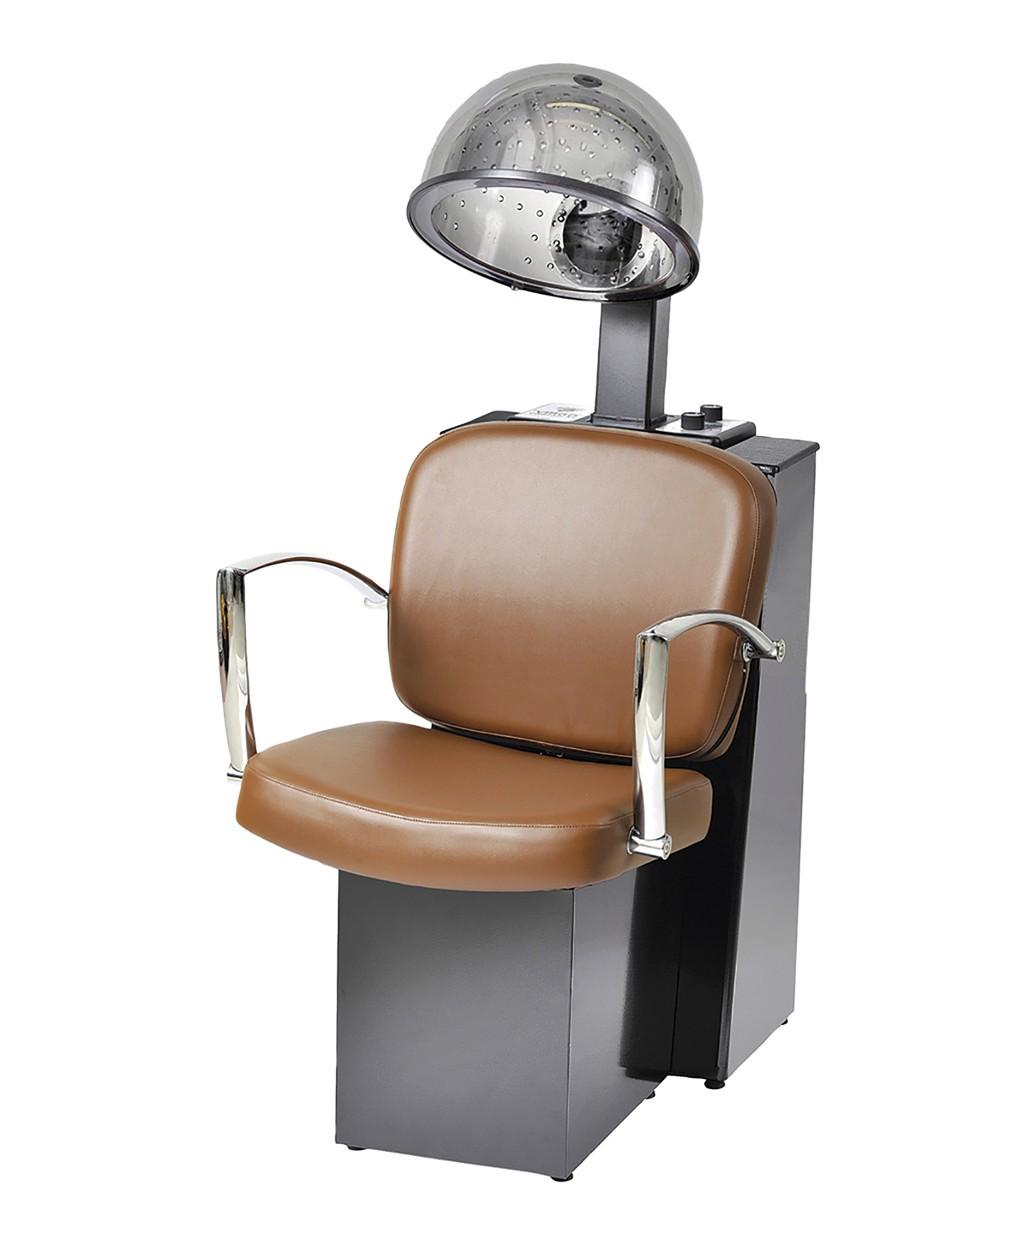 4 Operator Pibbs 3606 Messina Salon Package Pibbs 3769 Pisa Dryer Chair